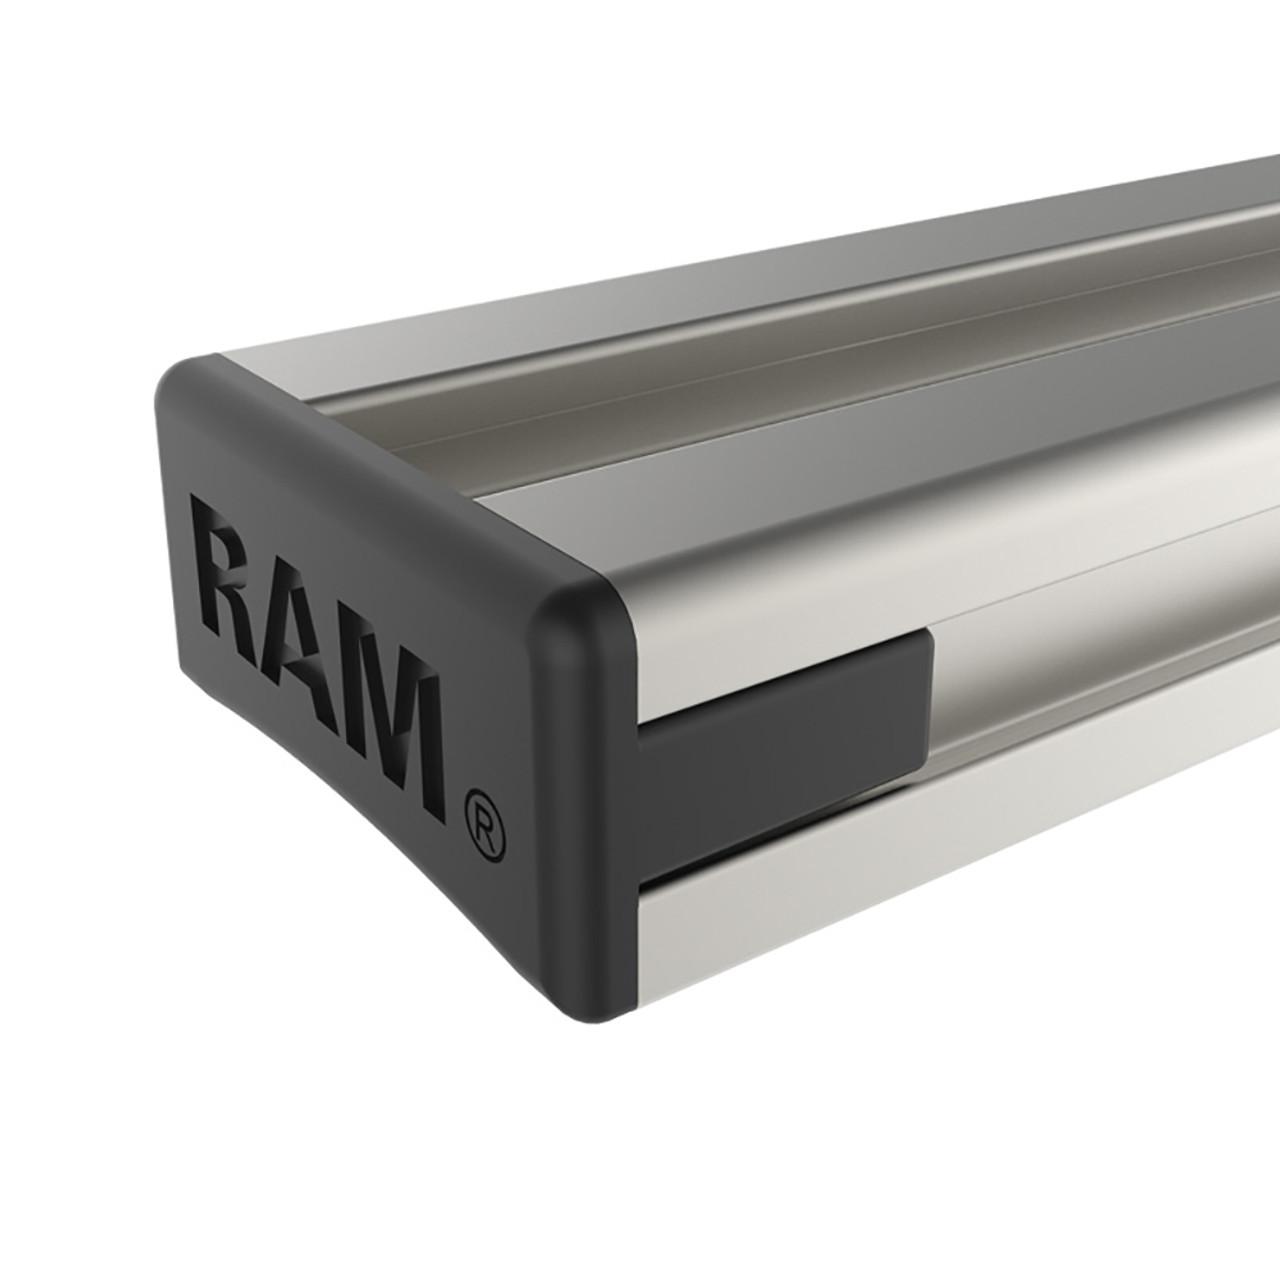 "Ram Mount 3"" Extruded Aluminum Tough-Track [RAM-TRACK-EXA-3]"